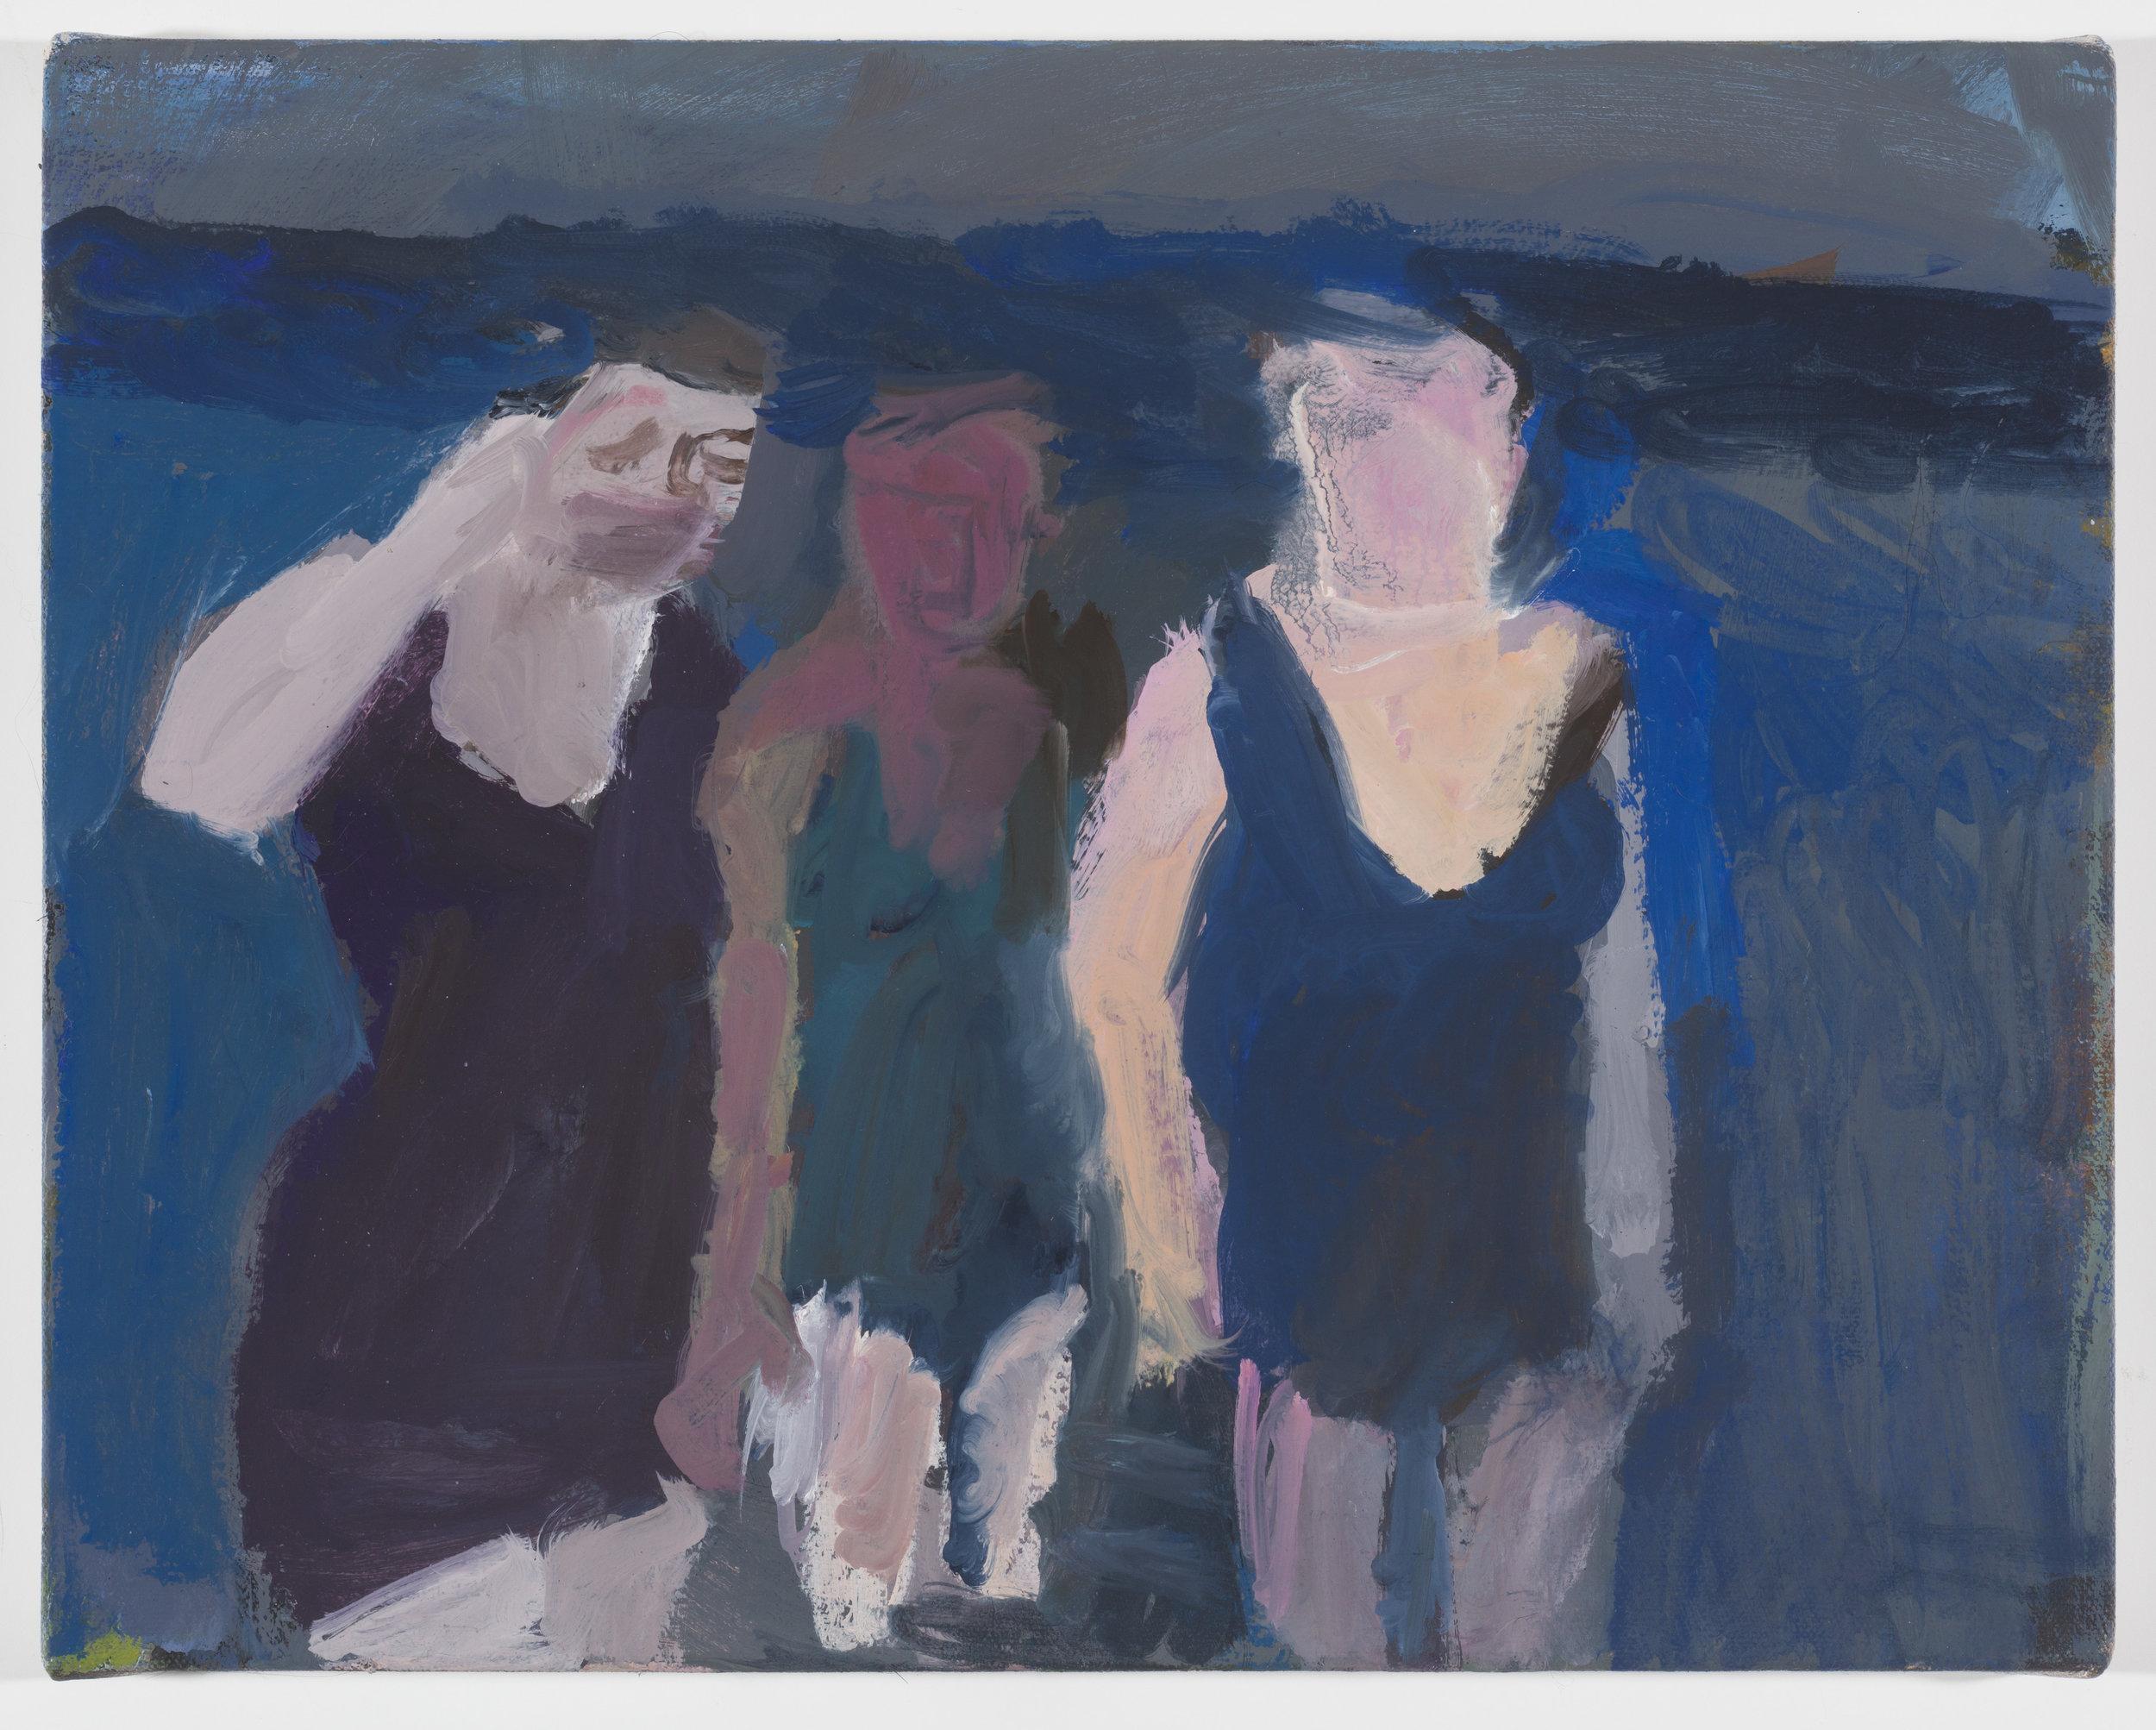 Blue Bathing Suits II